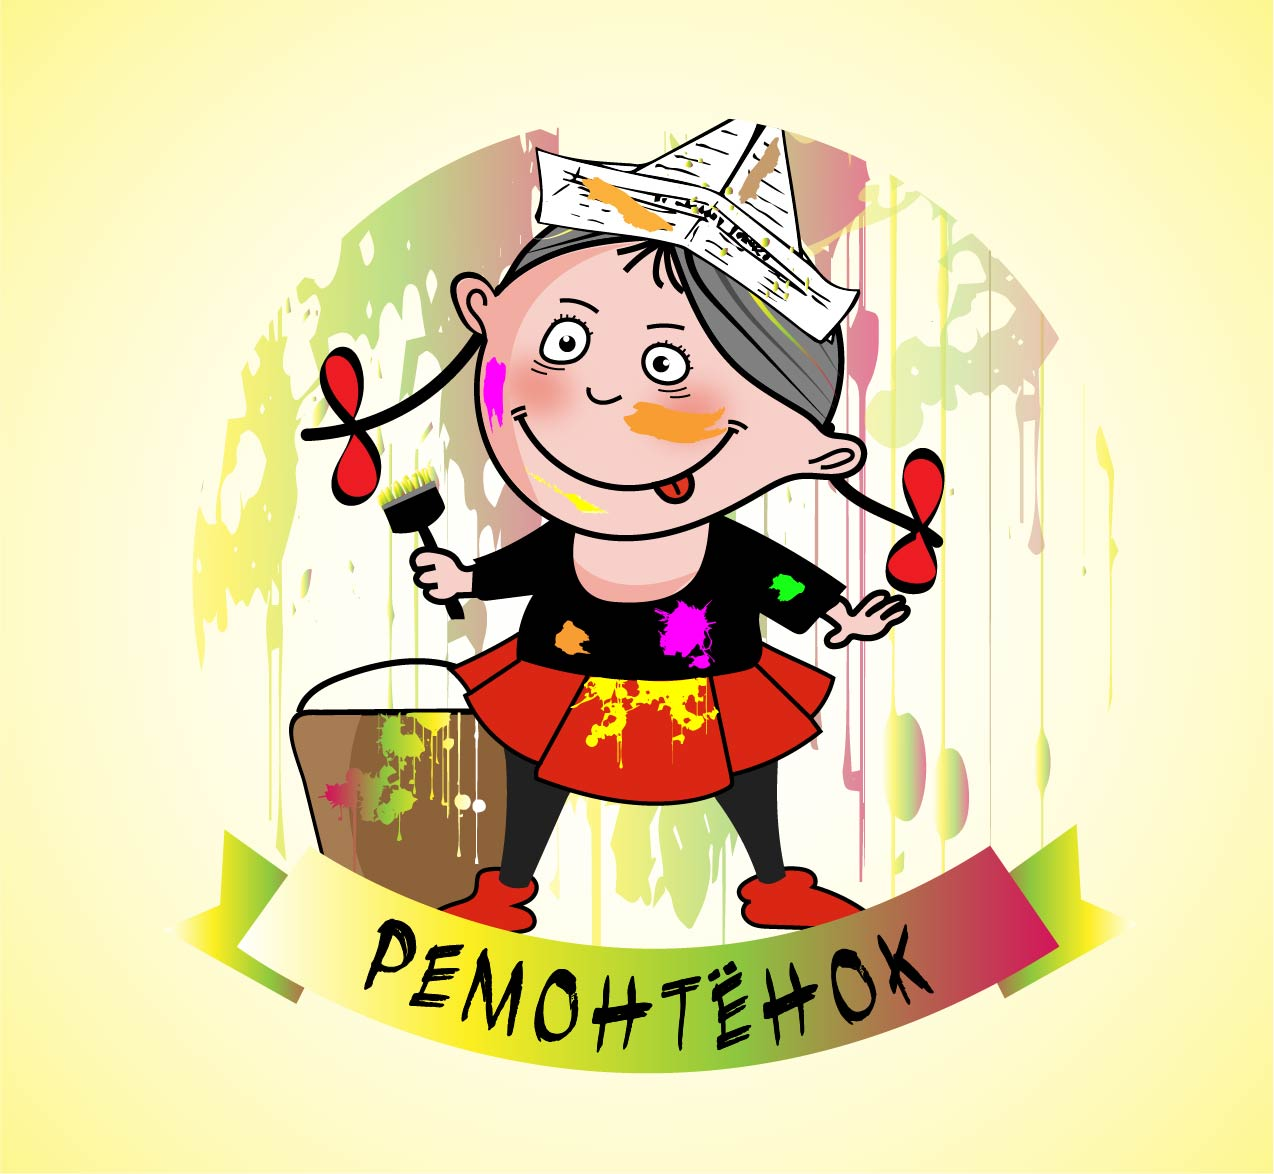 Ремонтёнок: логотип + брэндбук + фирменный стиль фото f_0165956229b53915.jpg